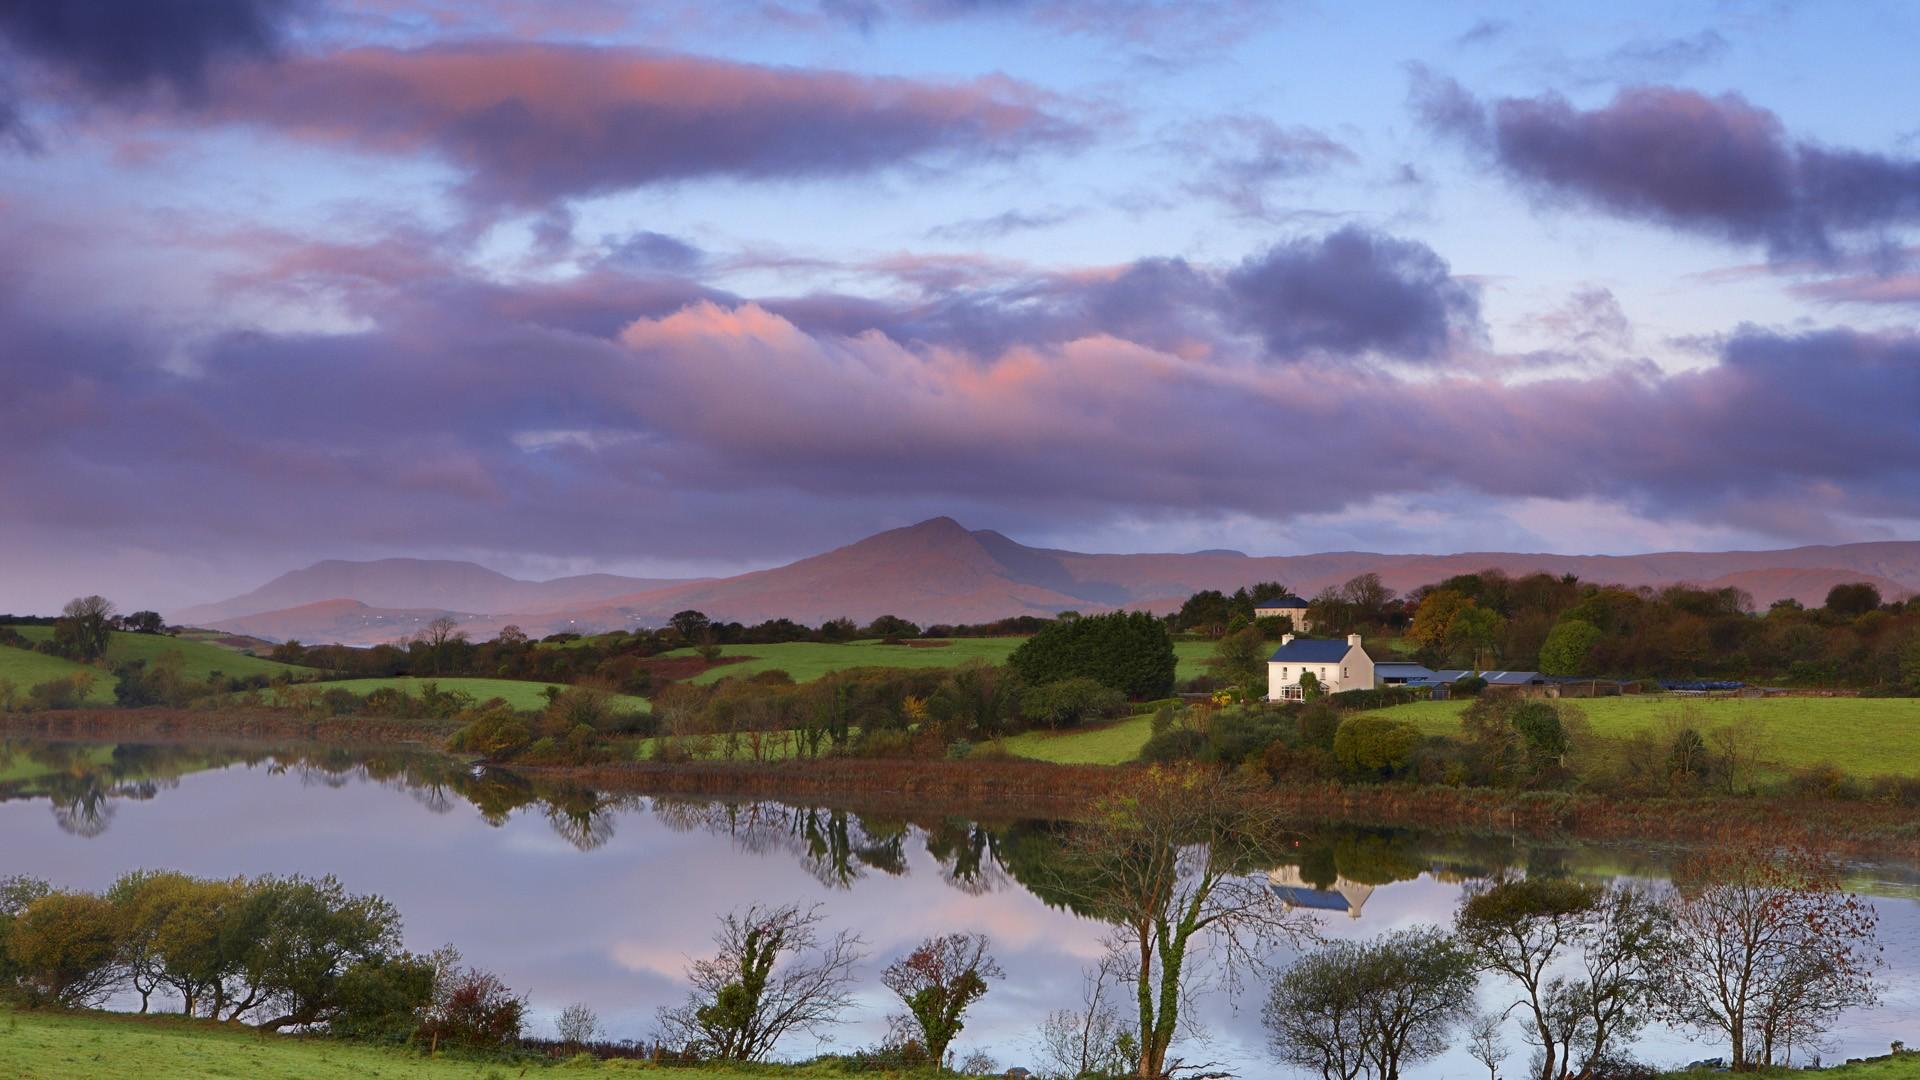 Beautiful Evening in Ireland   Wallpaper 33483 1920x1080